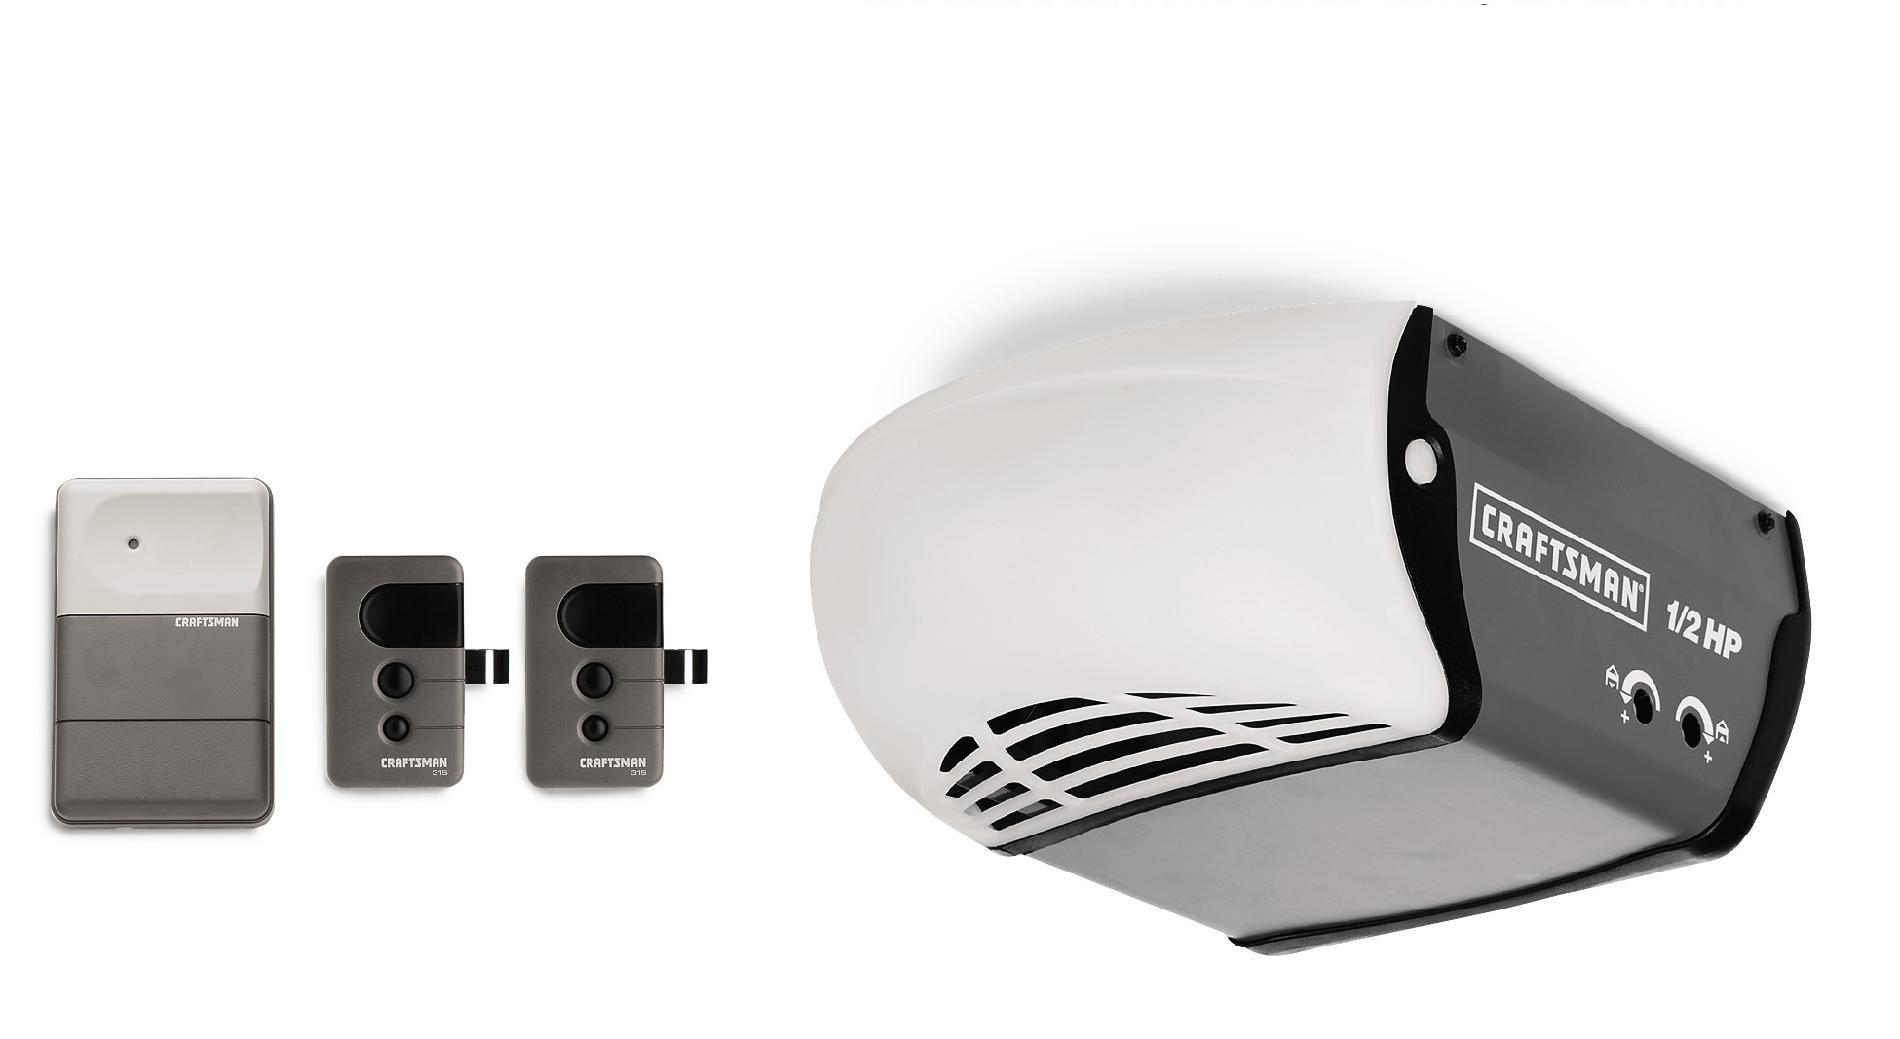 Craftsman 1/2 HP Chain Drive Garage Door Opener with 1 Additional Remote